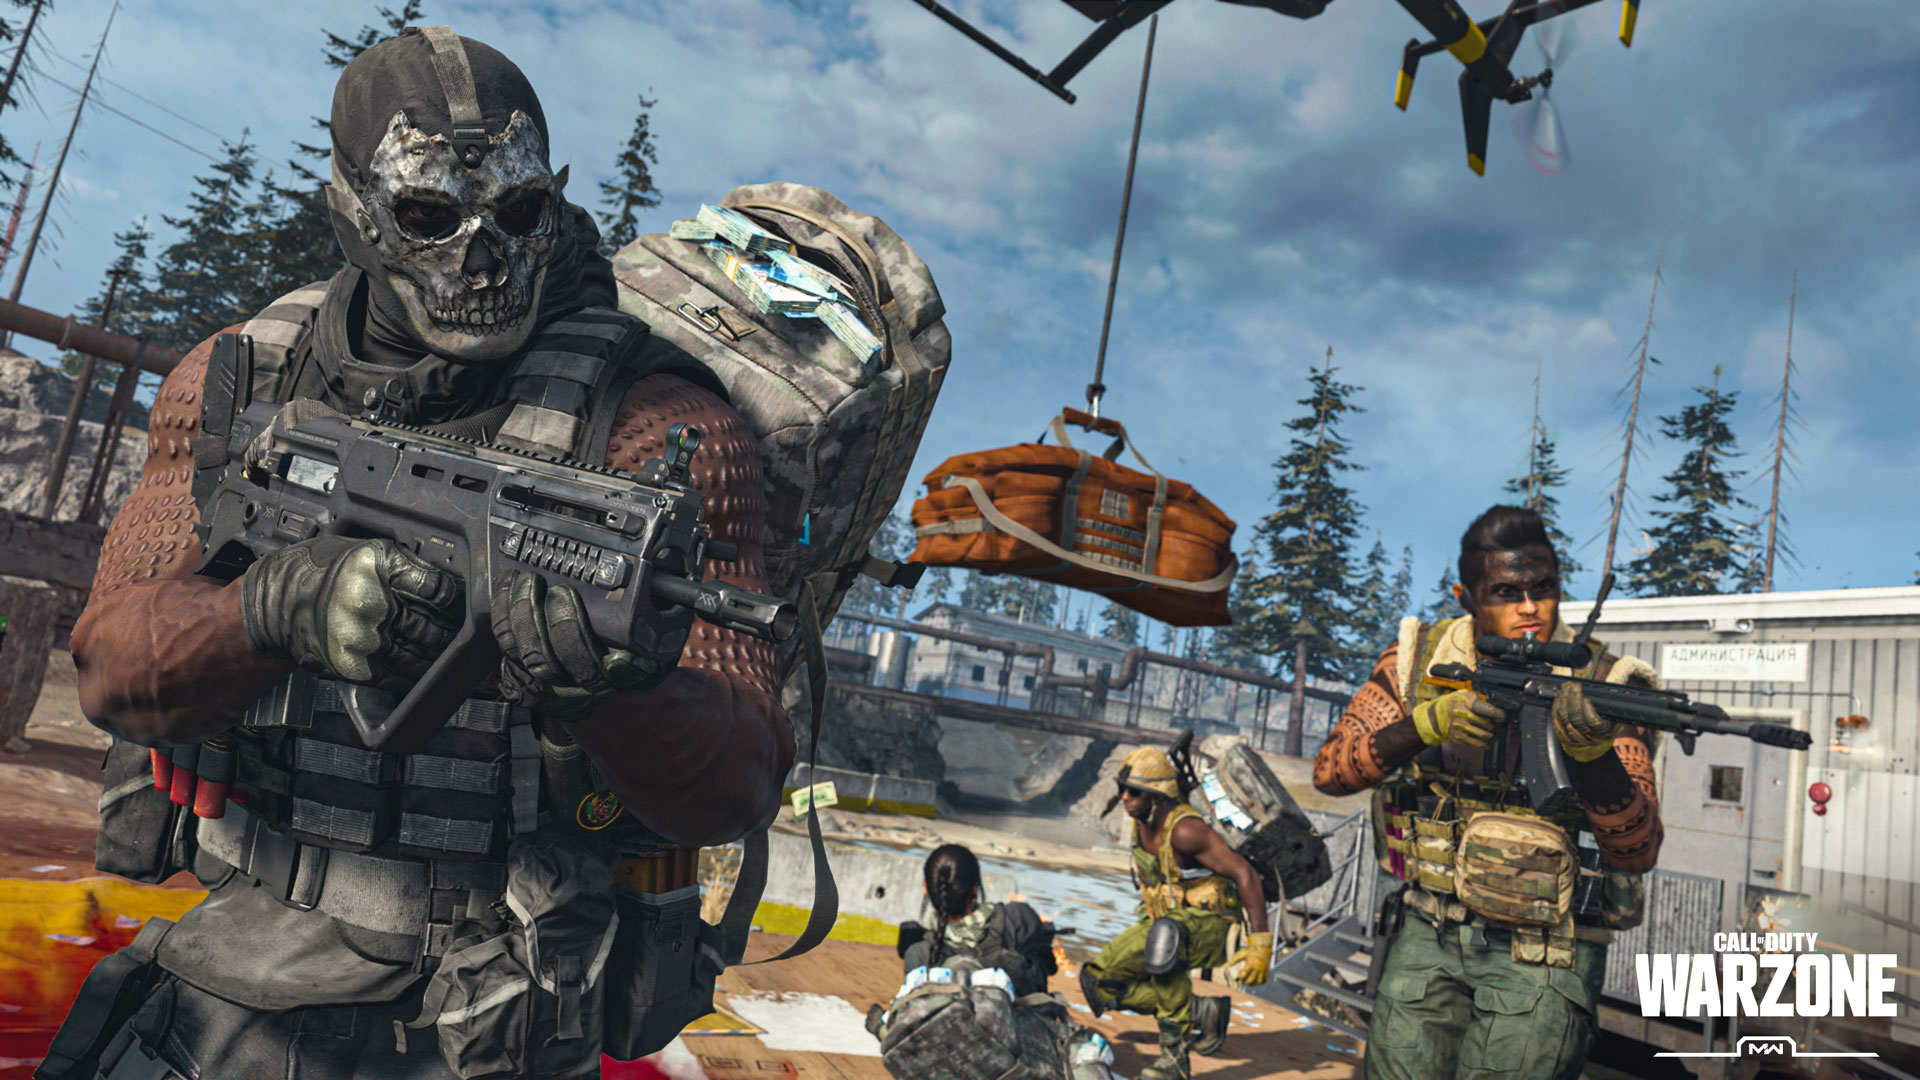 Call Of Duty Warzone Saldiri Helikopterleri Geri Dondu Oyunpat-oyunpat